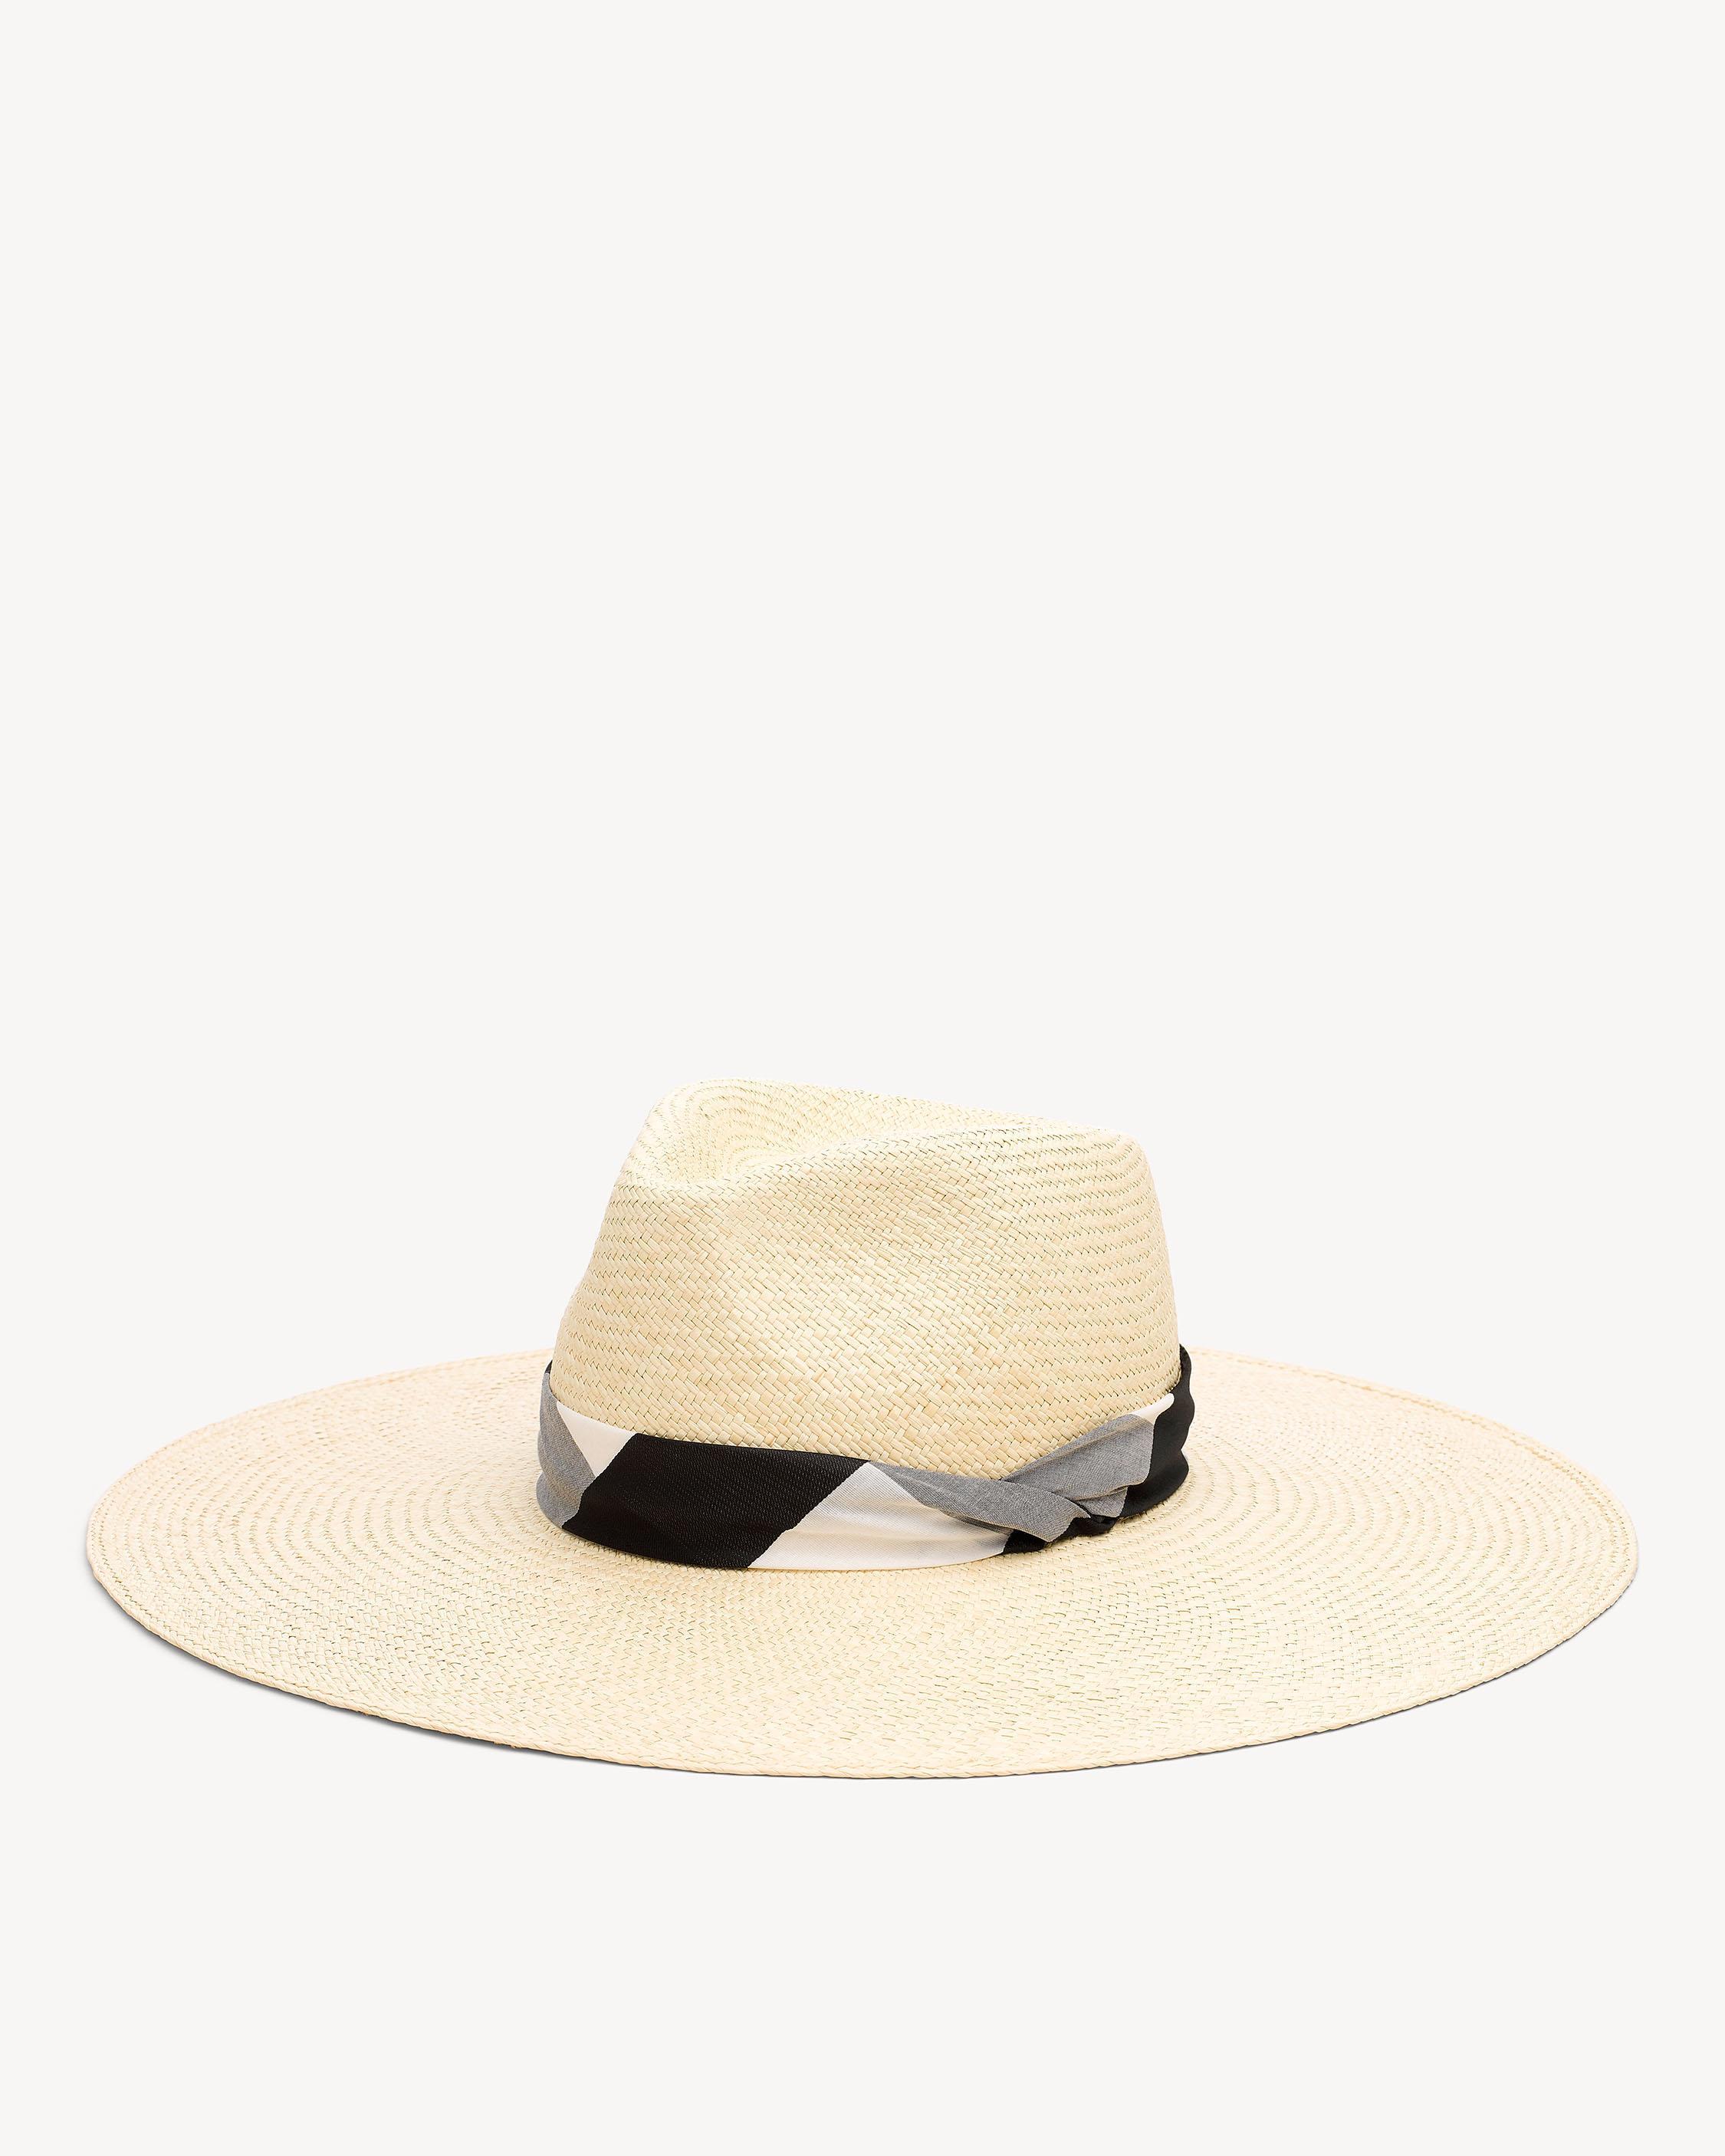 9c1384d14ca67 Wide Brim Panama Hat